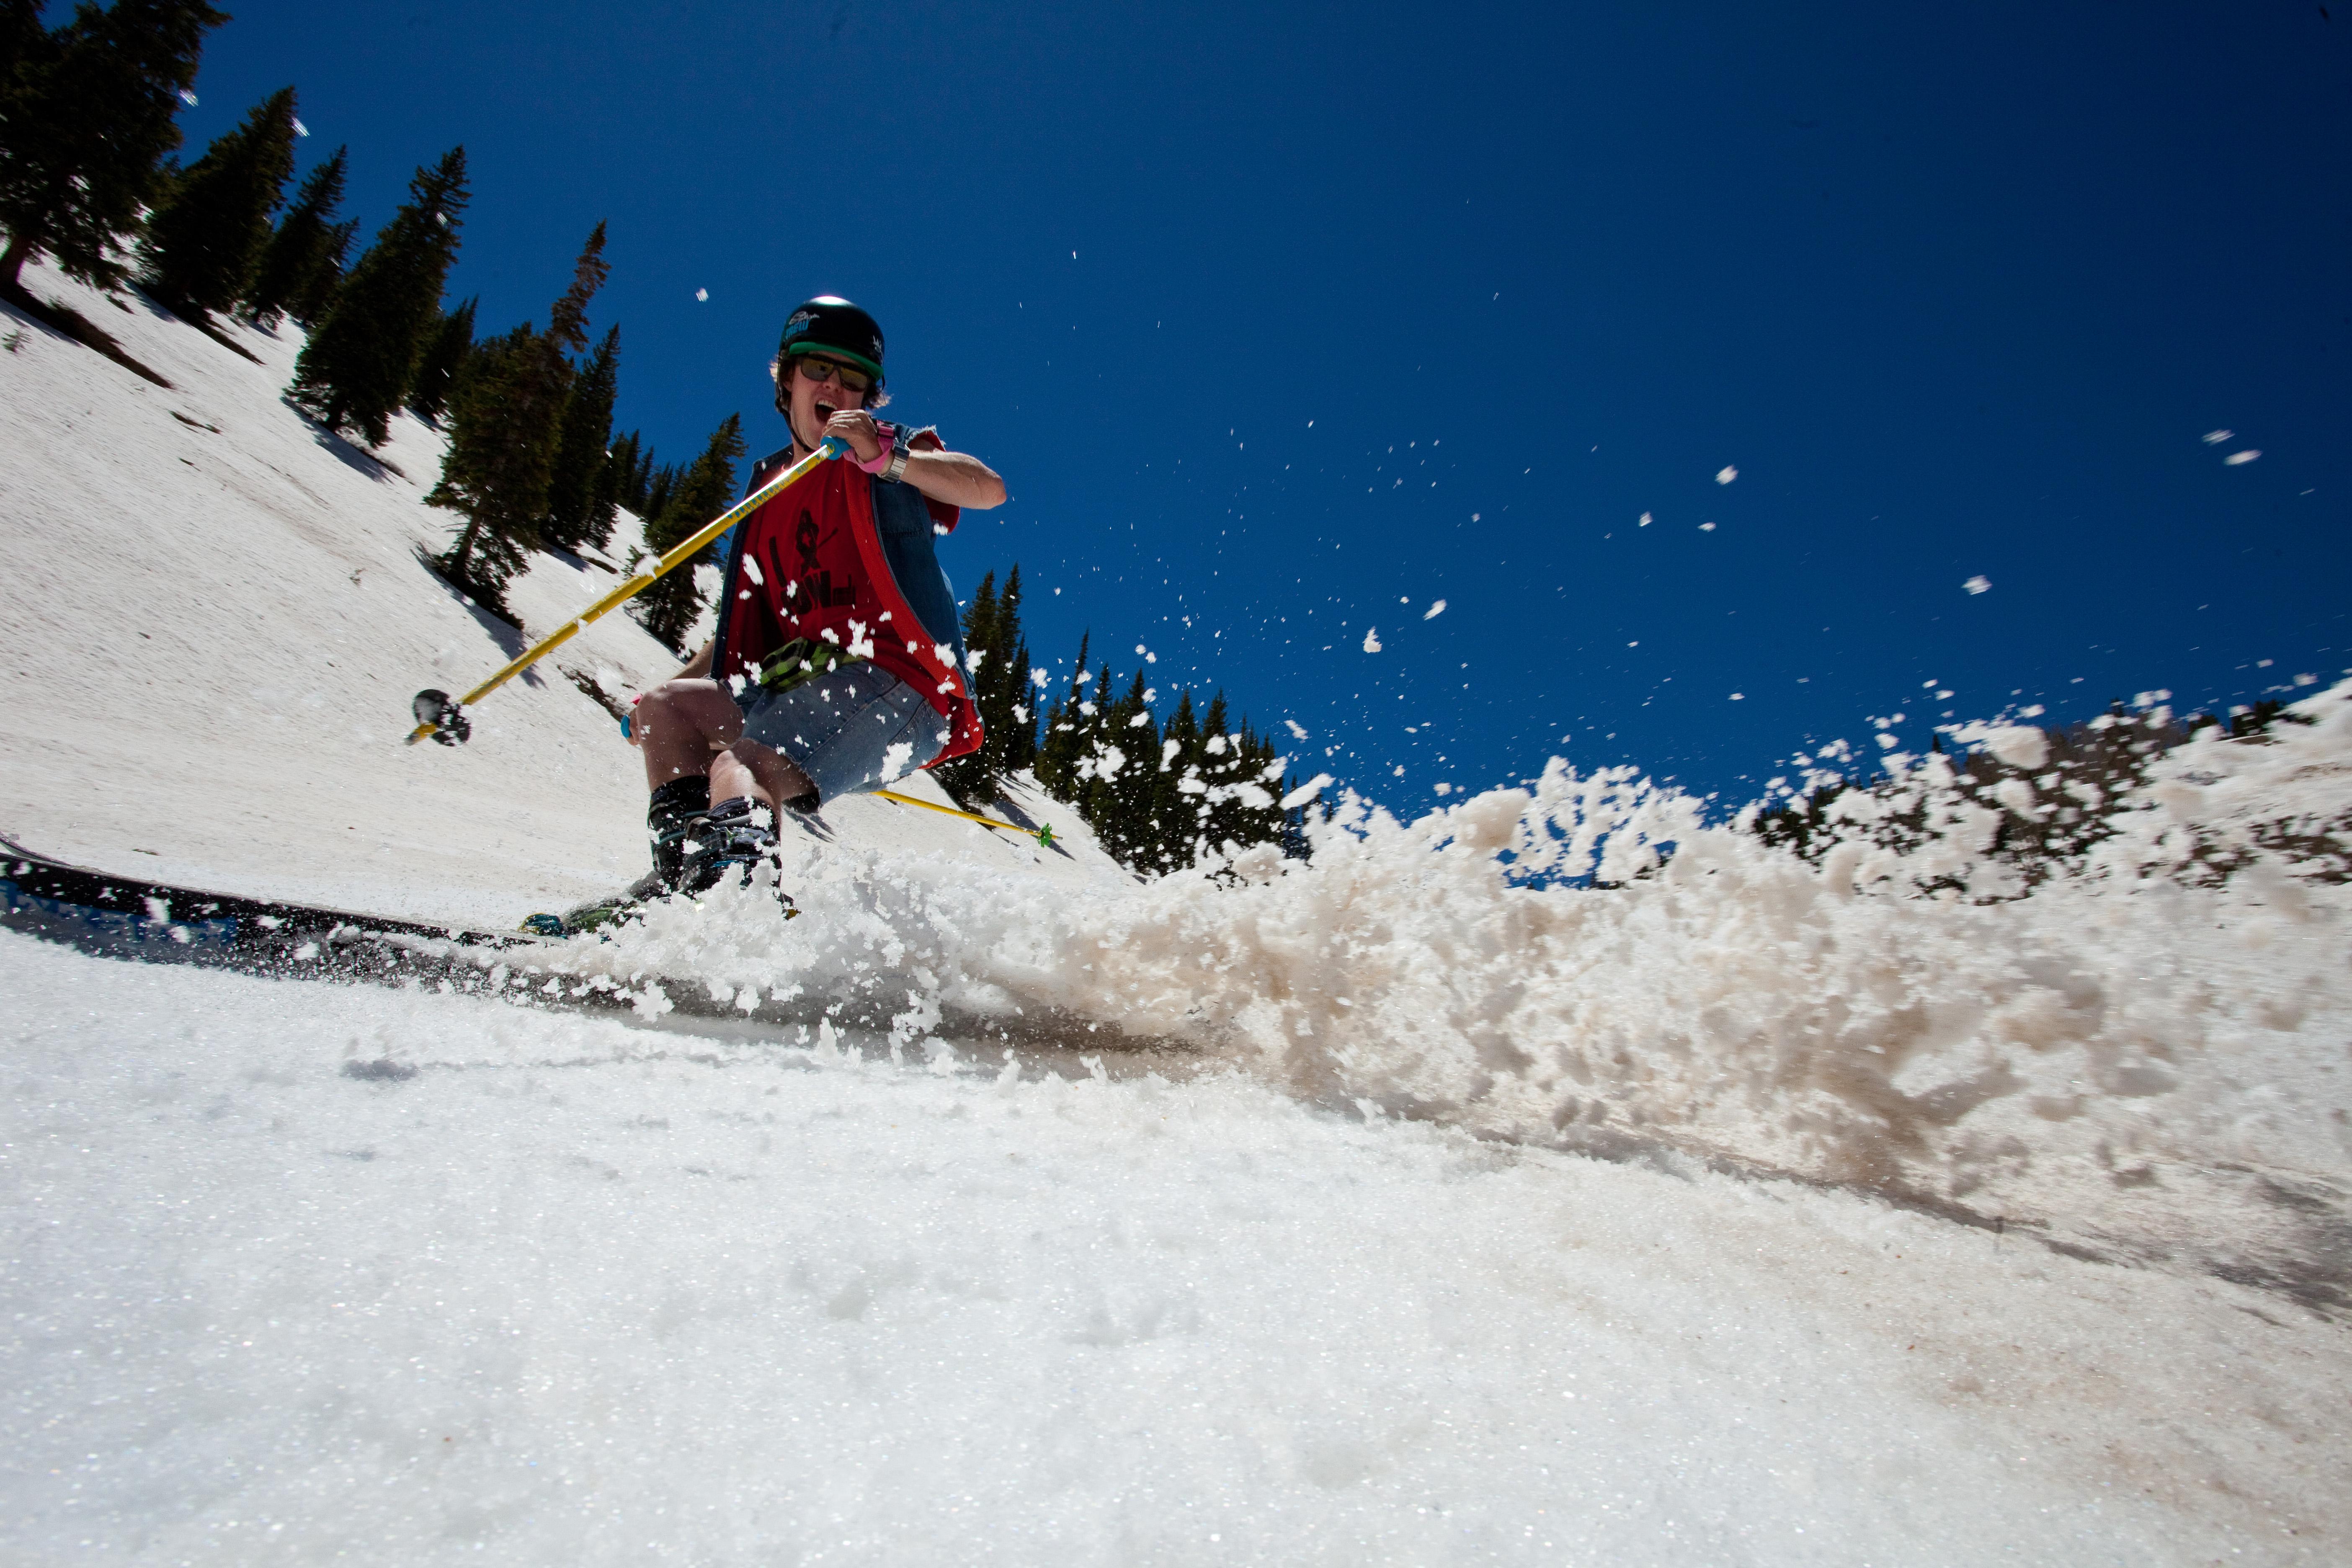 skiing in aspen slushy spring snow conditions